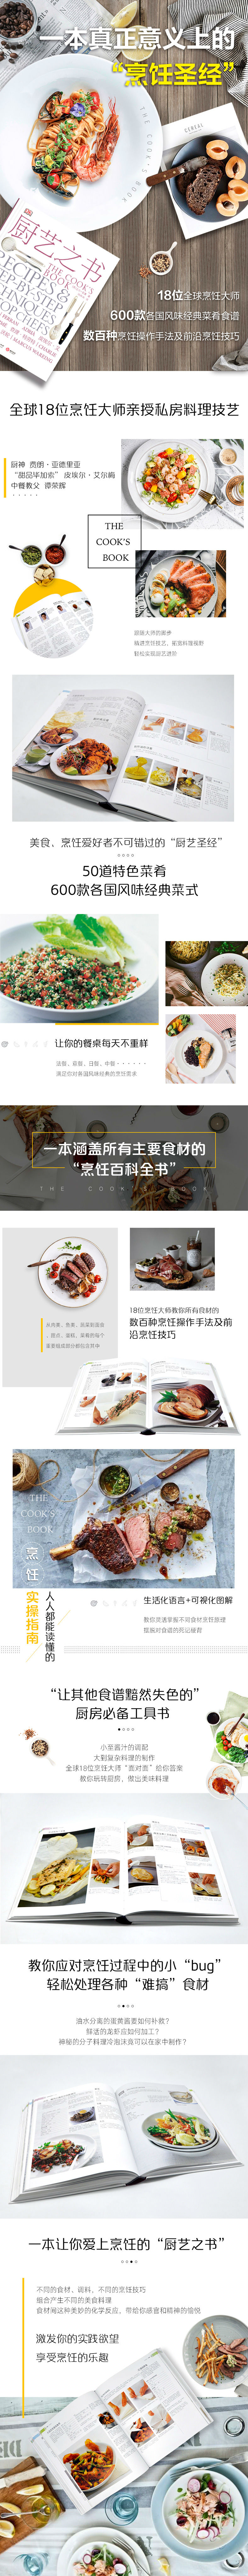 《DK厨艺之书》介绍